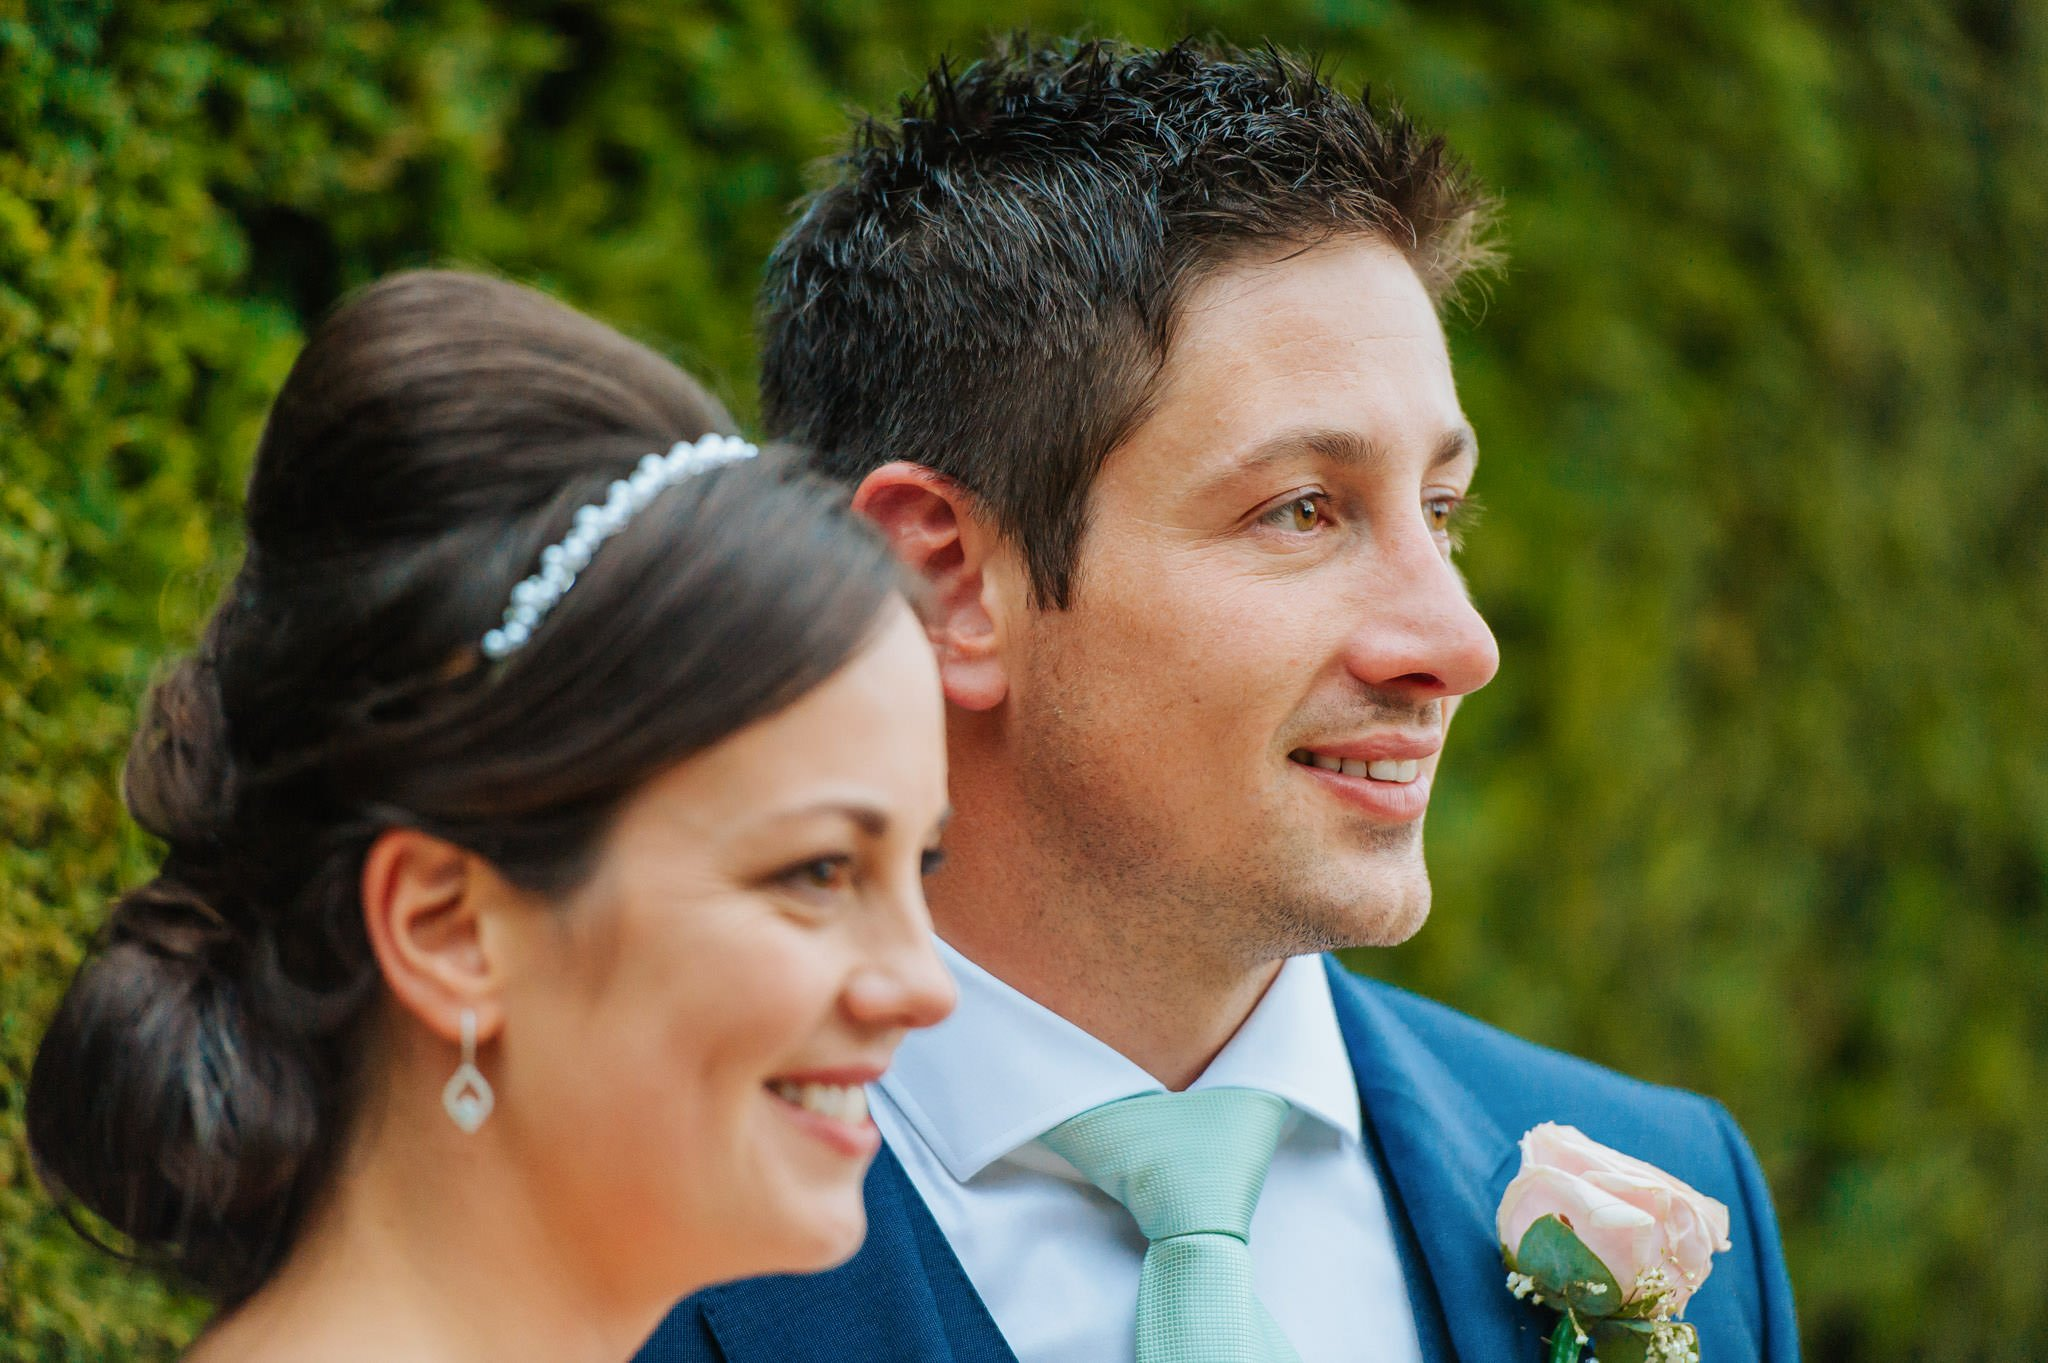 Eastnor Castle wedding photographer Herefordshire, West Midlands - Sarah + Dean 57